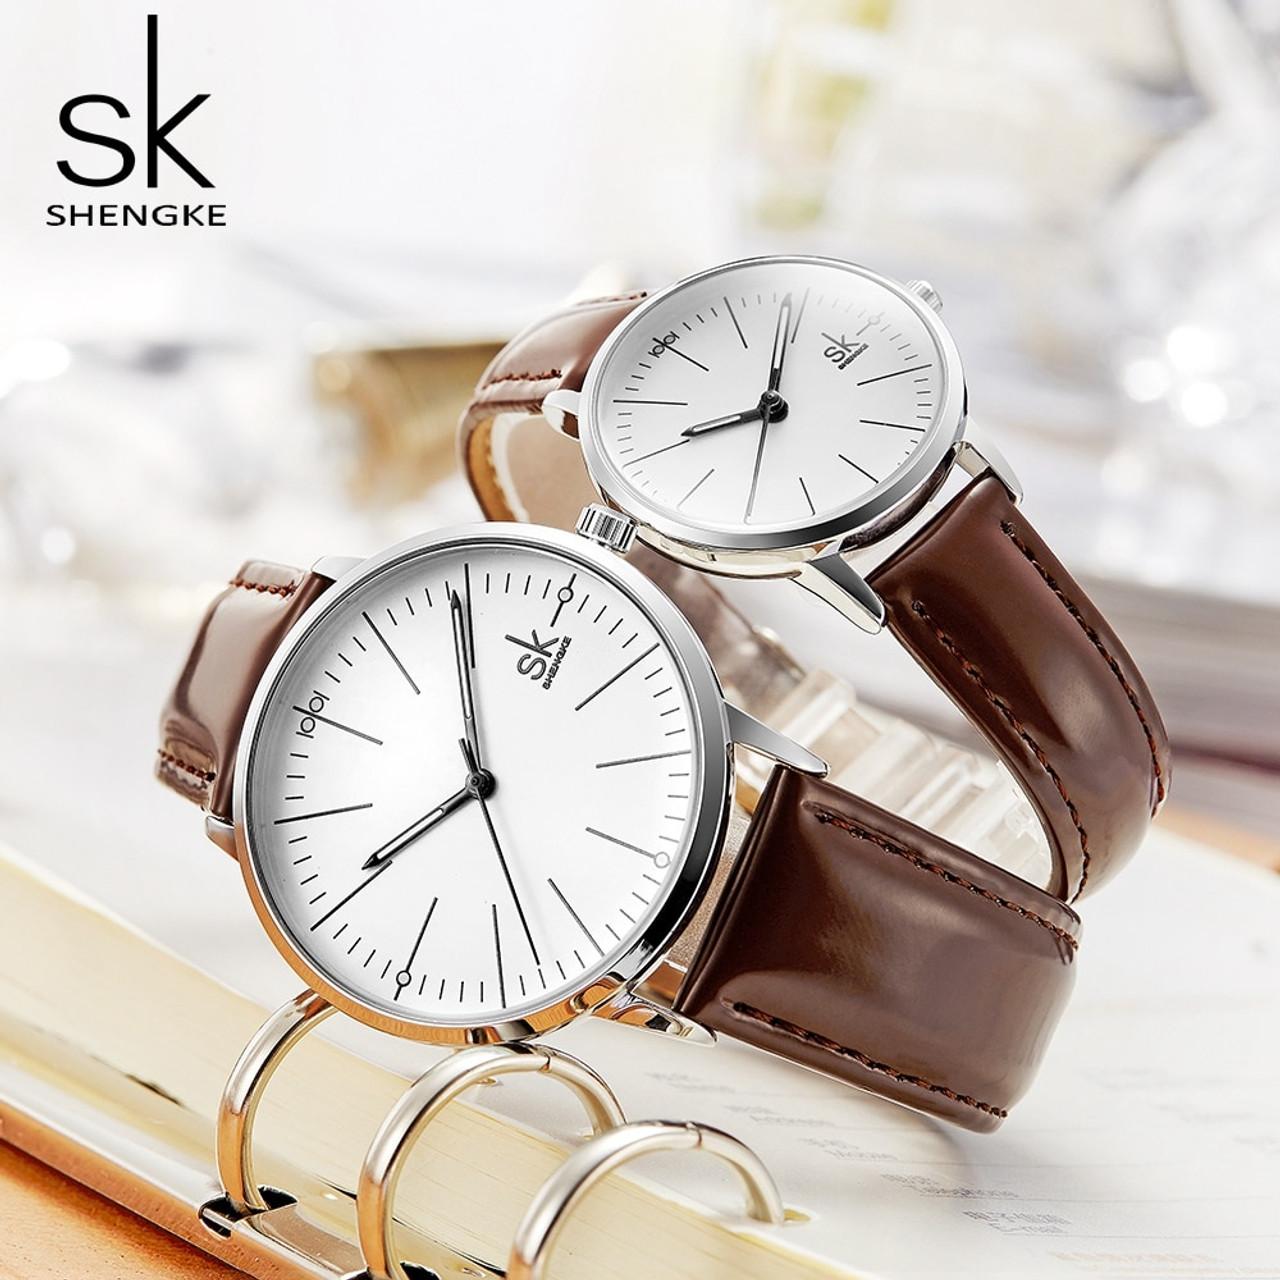 3c14a5df7246 SK New Couple Watch Men Women Watches Simple Quartz Reloj High Quality  Relogio Masculino Business Clock ...